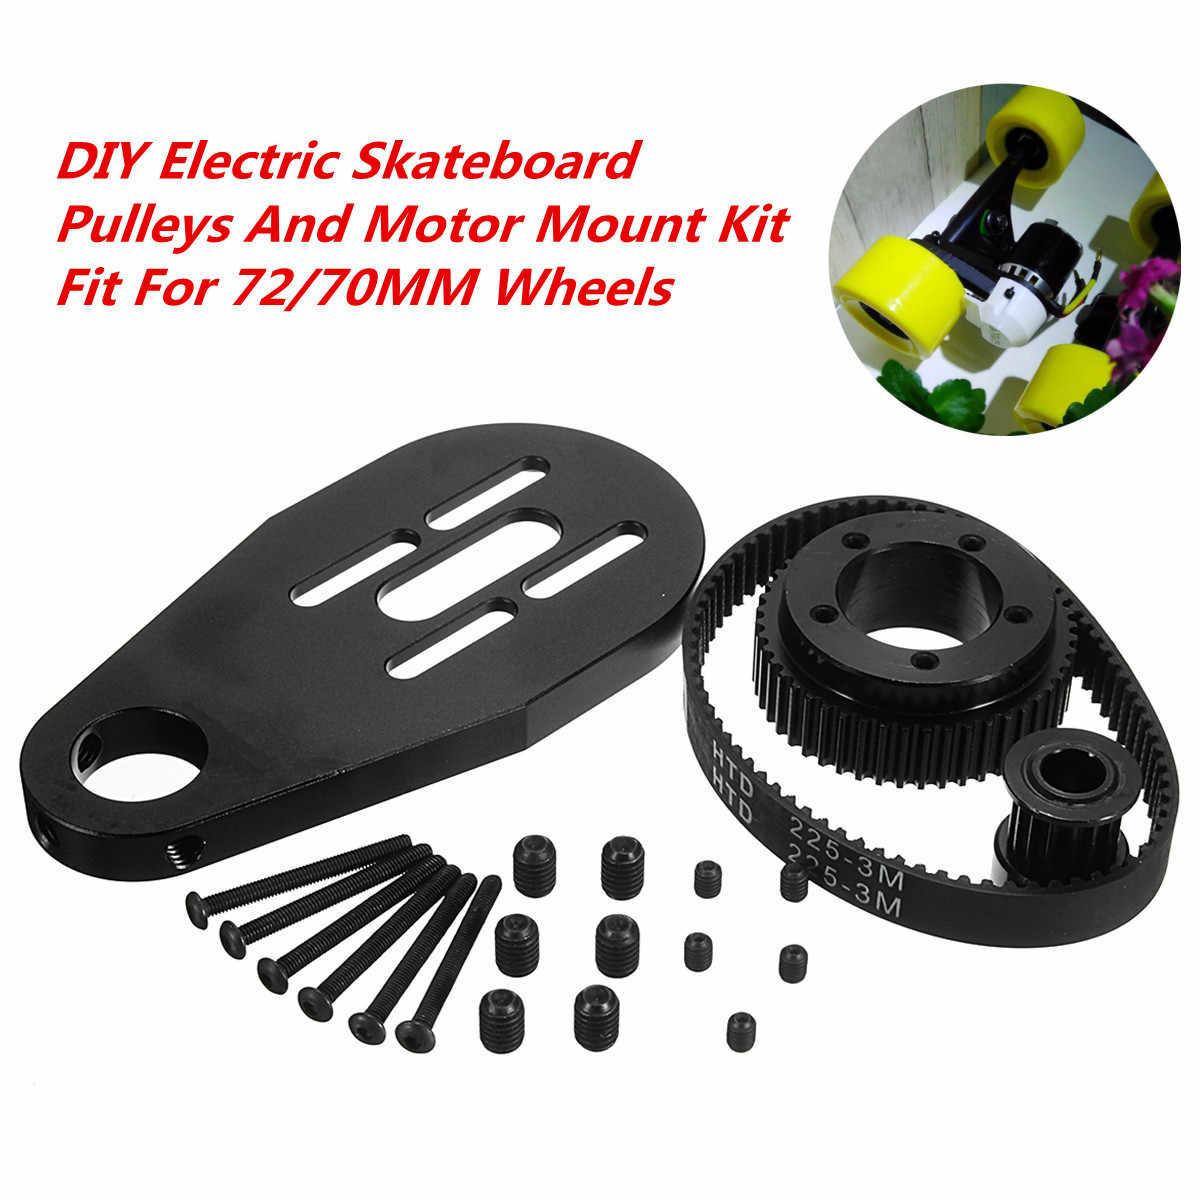 DIY חשמלי סקייטבורד ערכת חלקי גלגלות + מנוע הר + חגורה עבור 72/70 MM גלגלי סקייט לוח גלגלת